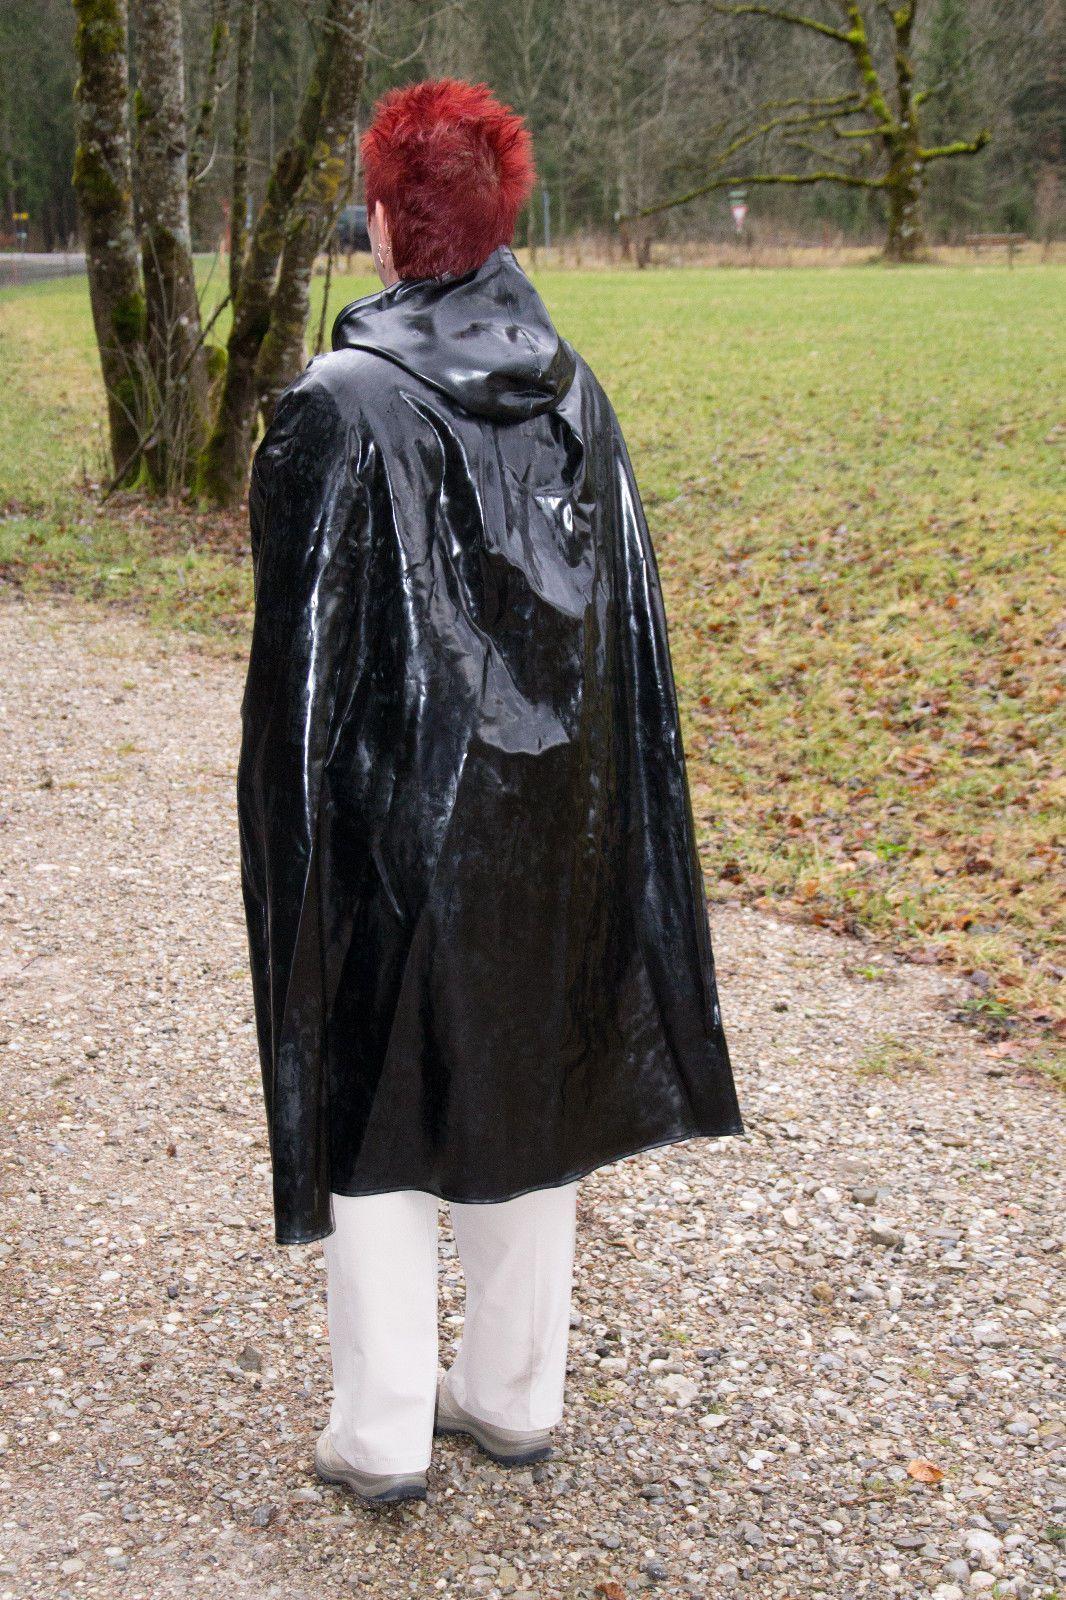 xxl regencape cape mit kapuze 1 27 lang gummi regenmantel rubber cape gumpla in kleidung. Black Bedroom Furniture Sets. Home Design Ideas